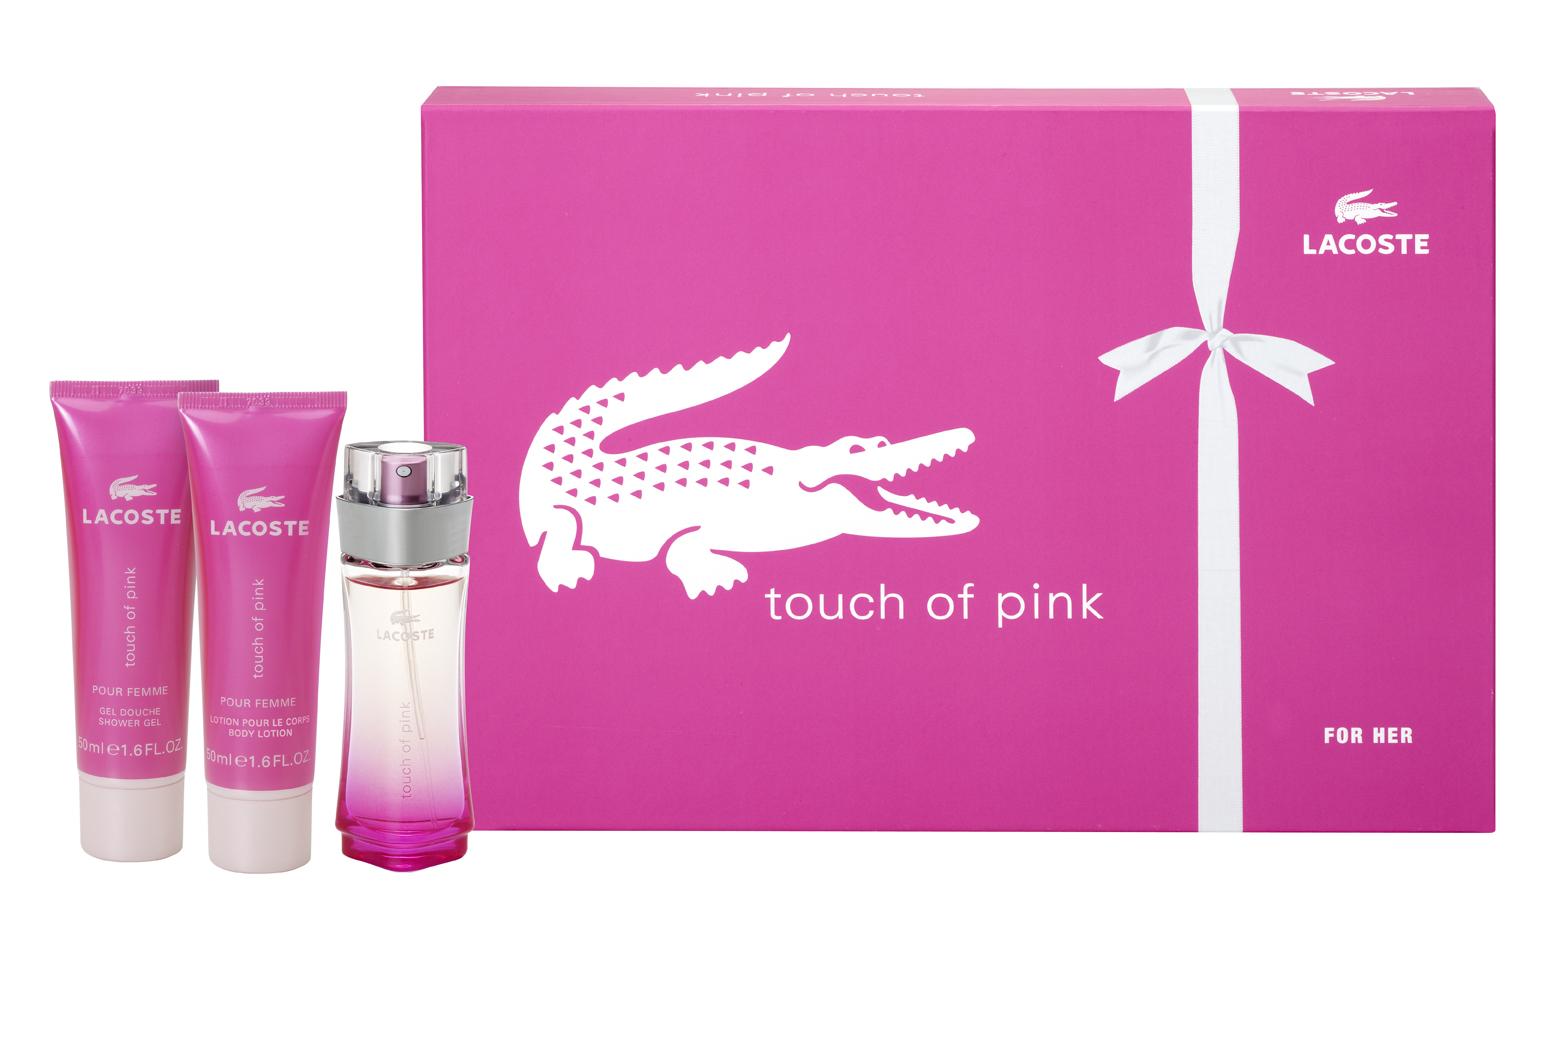 http://3.bp.blogspot.com/-D7juuguSYYU/TuCVWyIaxVI/AAAAAAAAFbU/5s0faLaluRc/s1600/Touch+of+Pink+giftset.jpeg